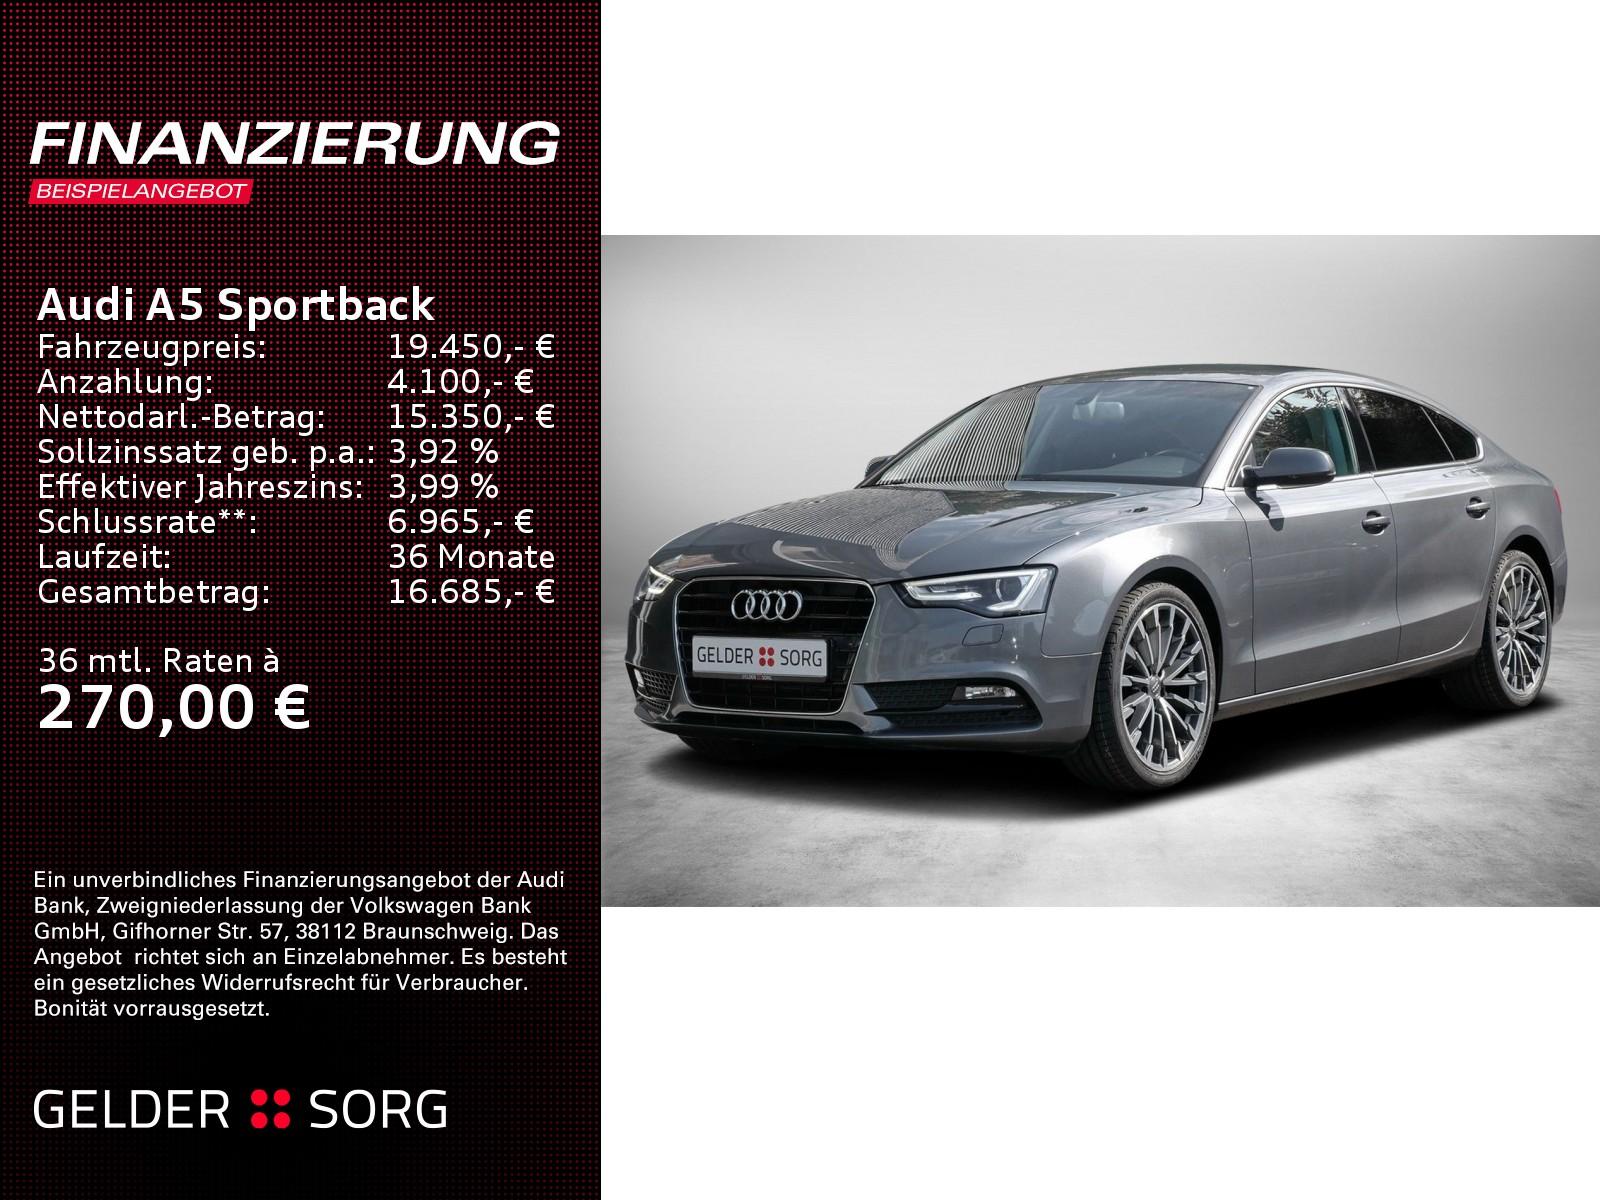 Audi A5 Sportback 2.0 TDI *Xenon*Navi*EPH*Klima*EURO6, Jahr 2016, Diesel